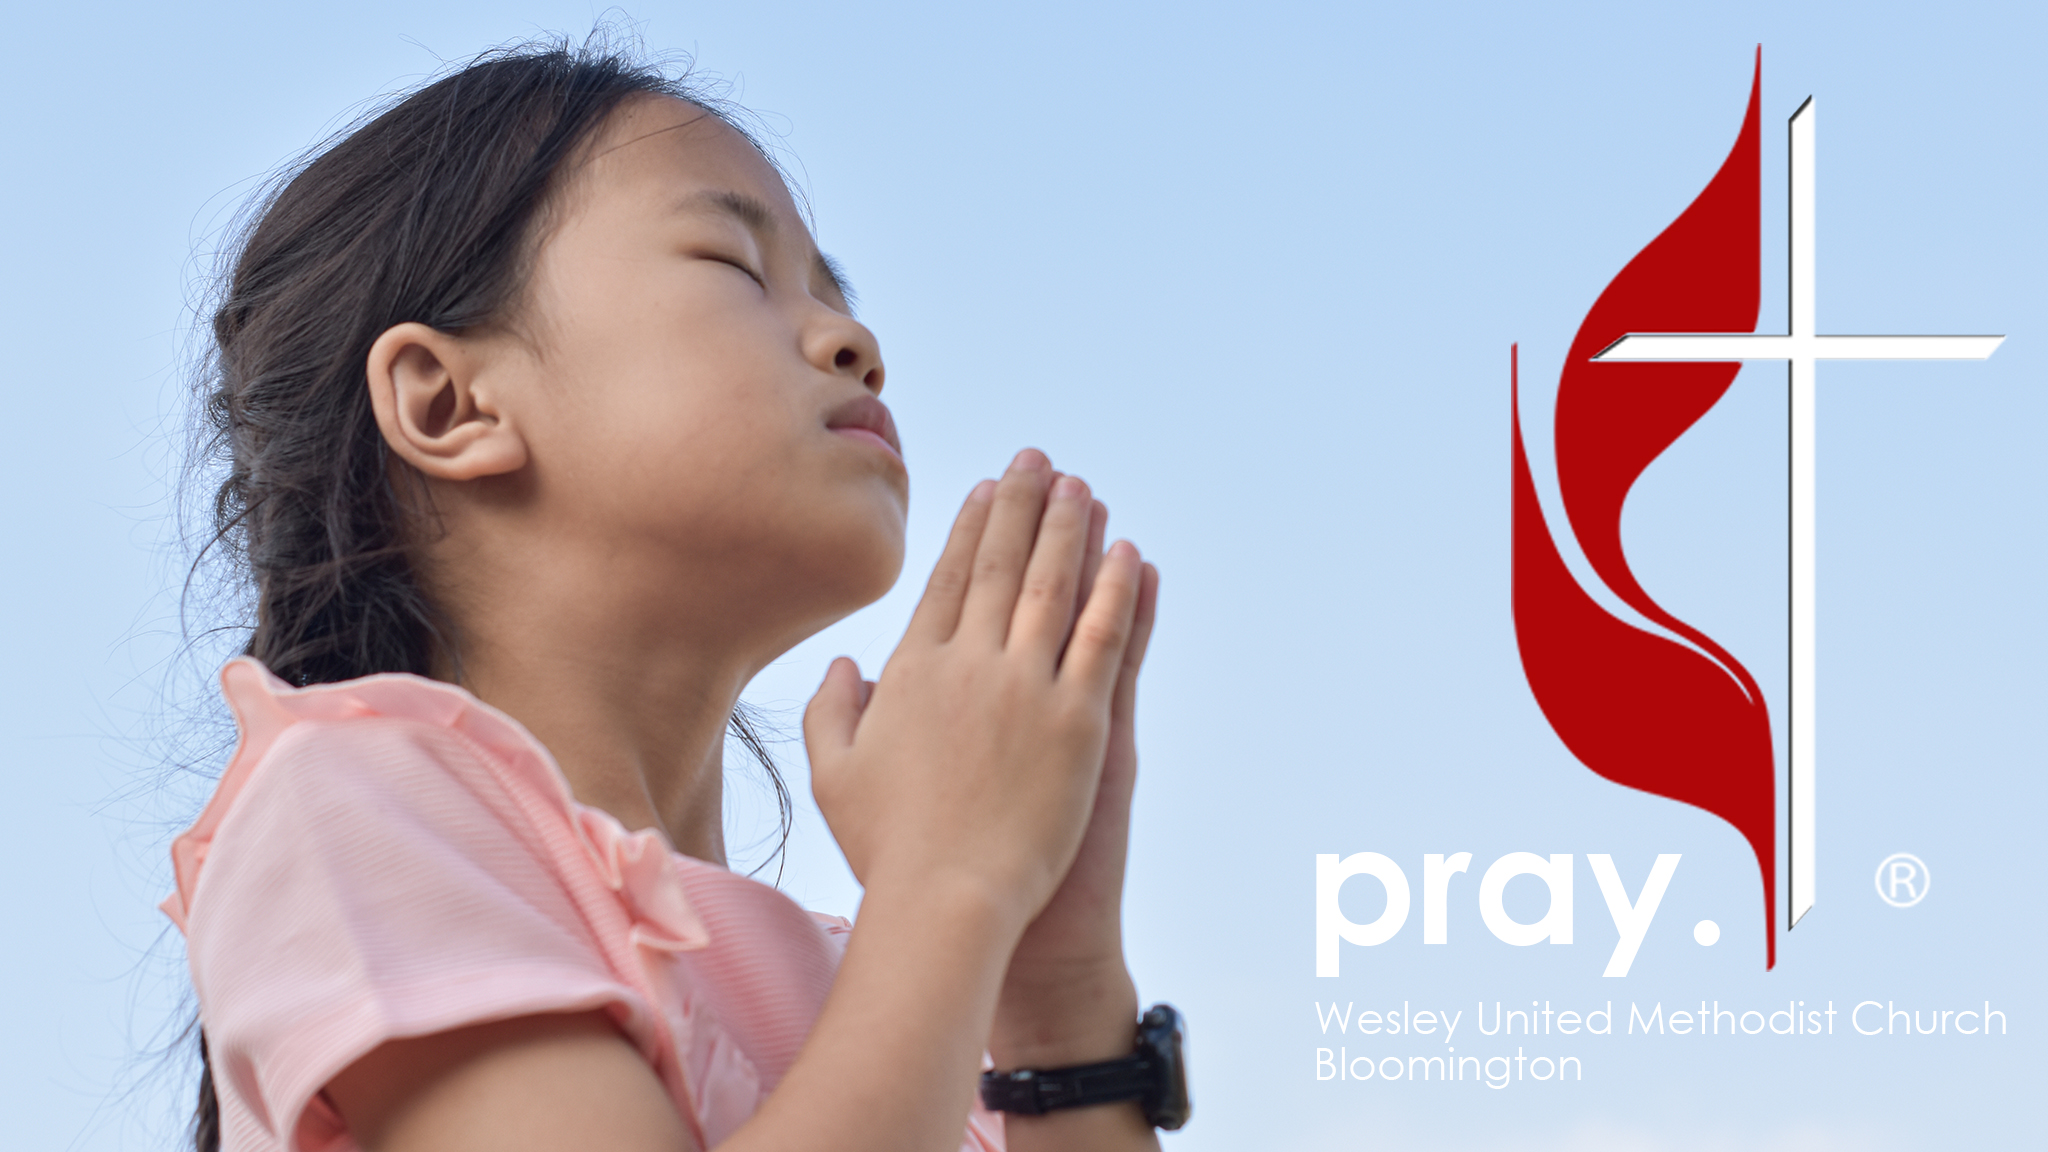 pray with wesley umc bloomington